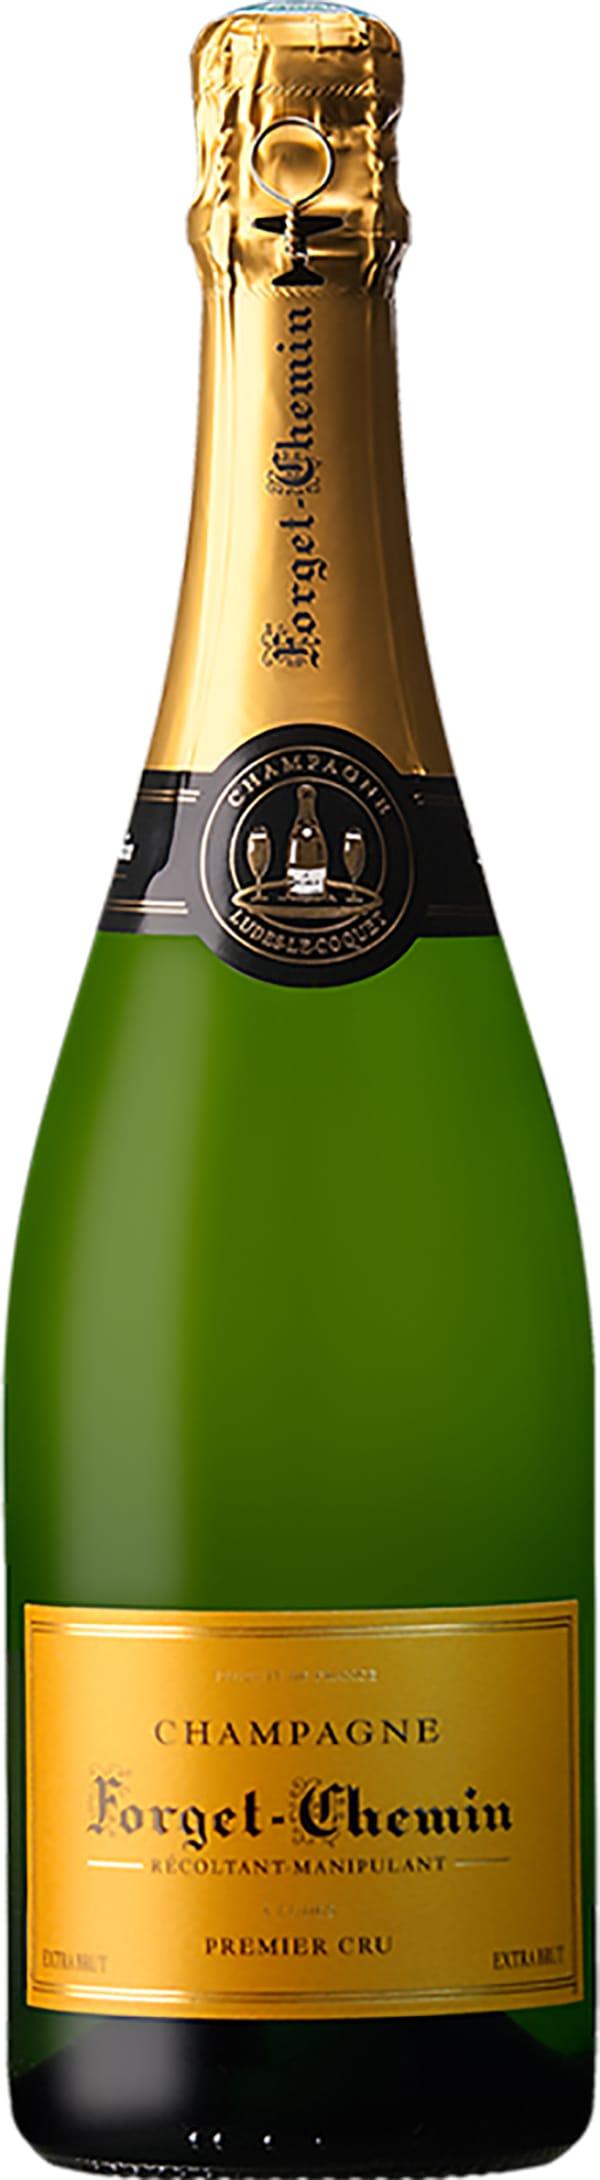 Forget-Chemin Premier Cru Champagne Extra Brut